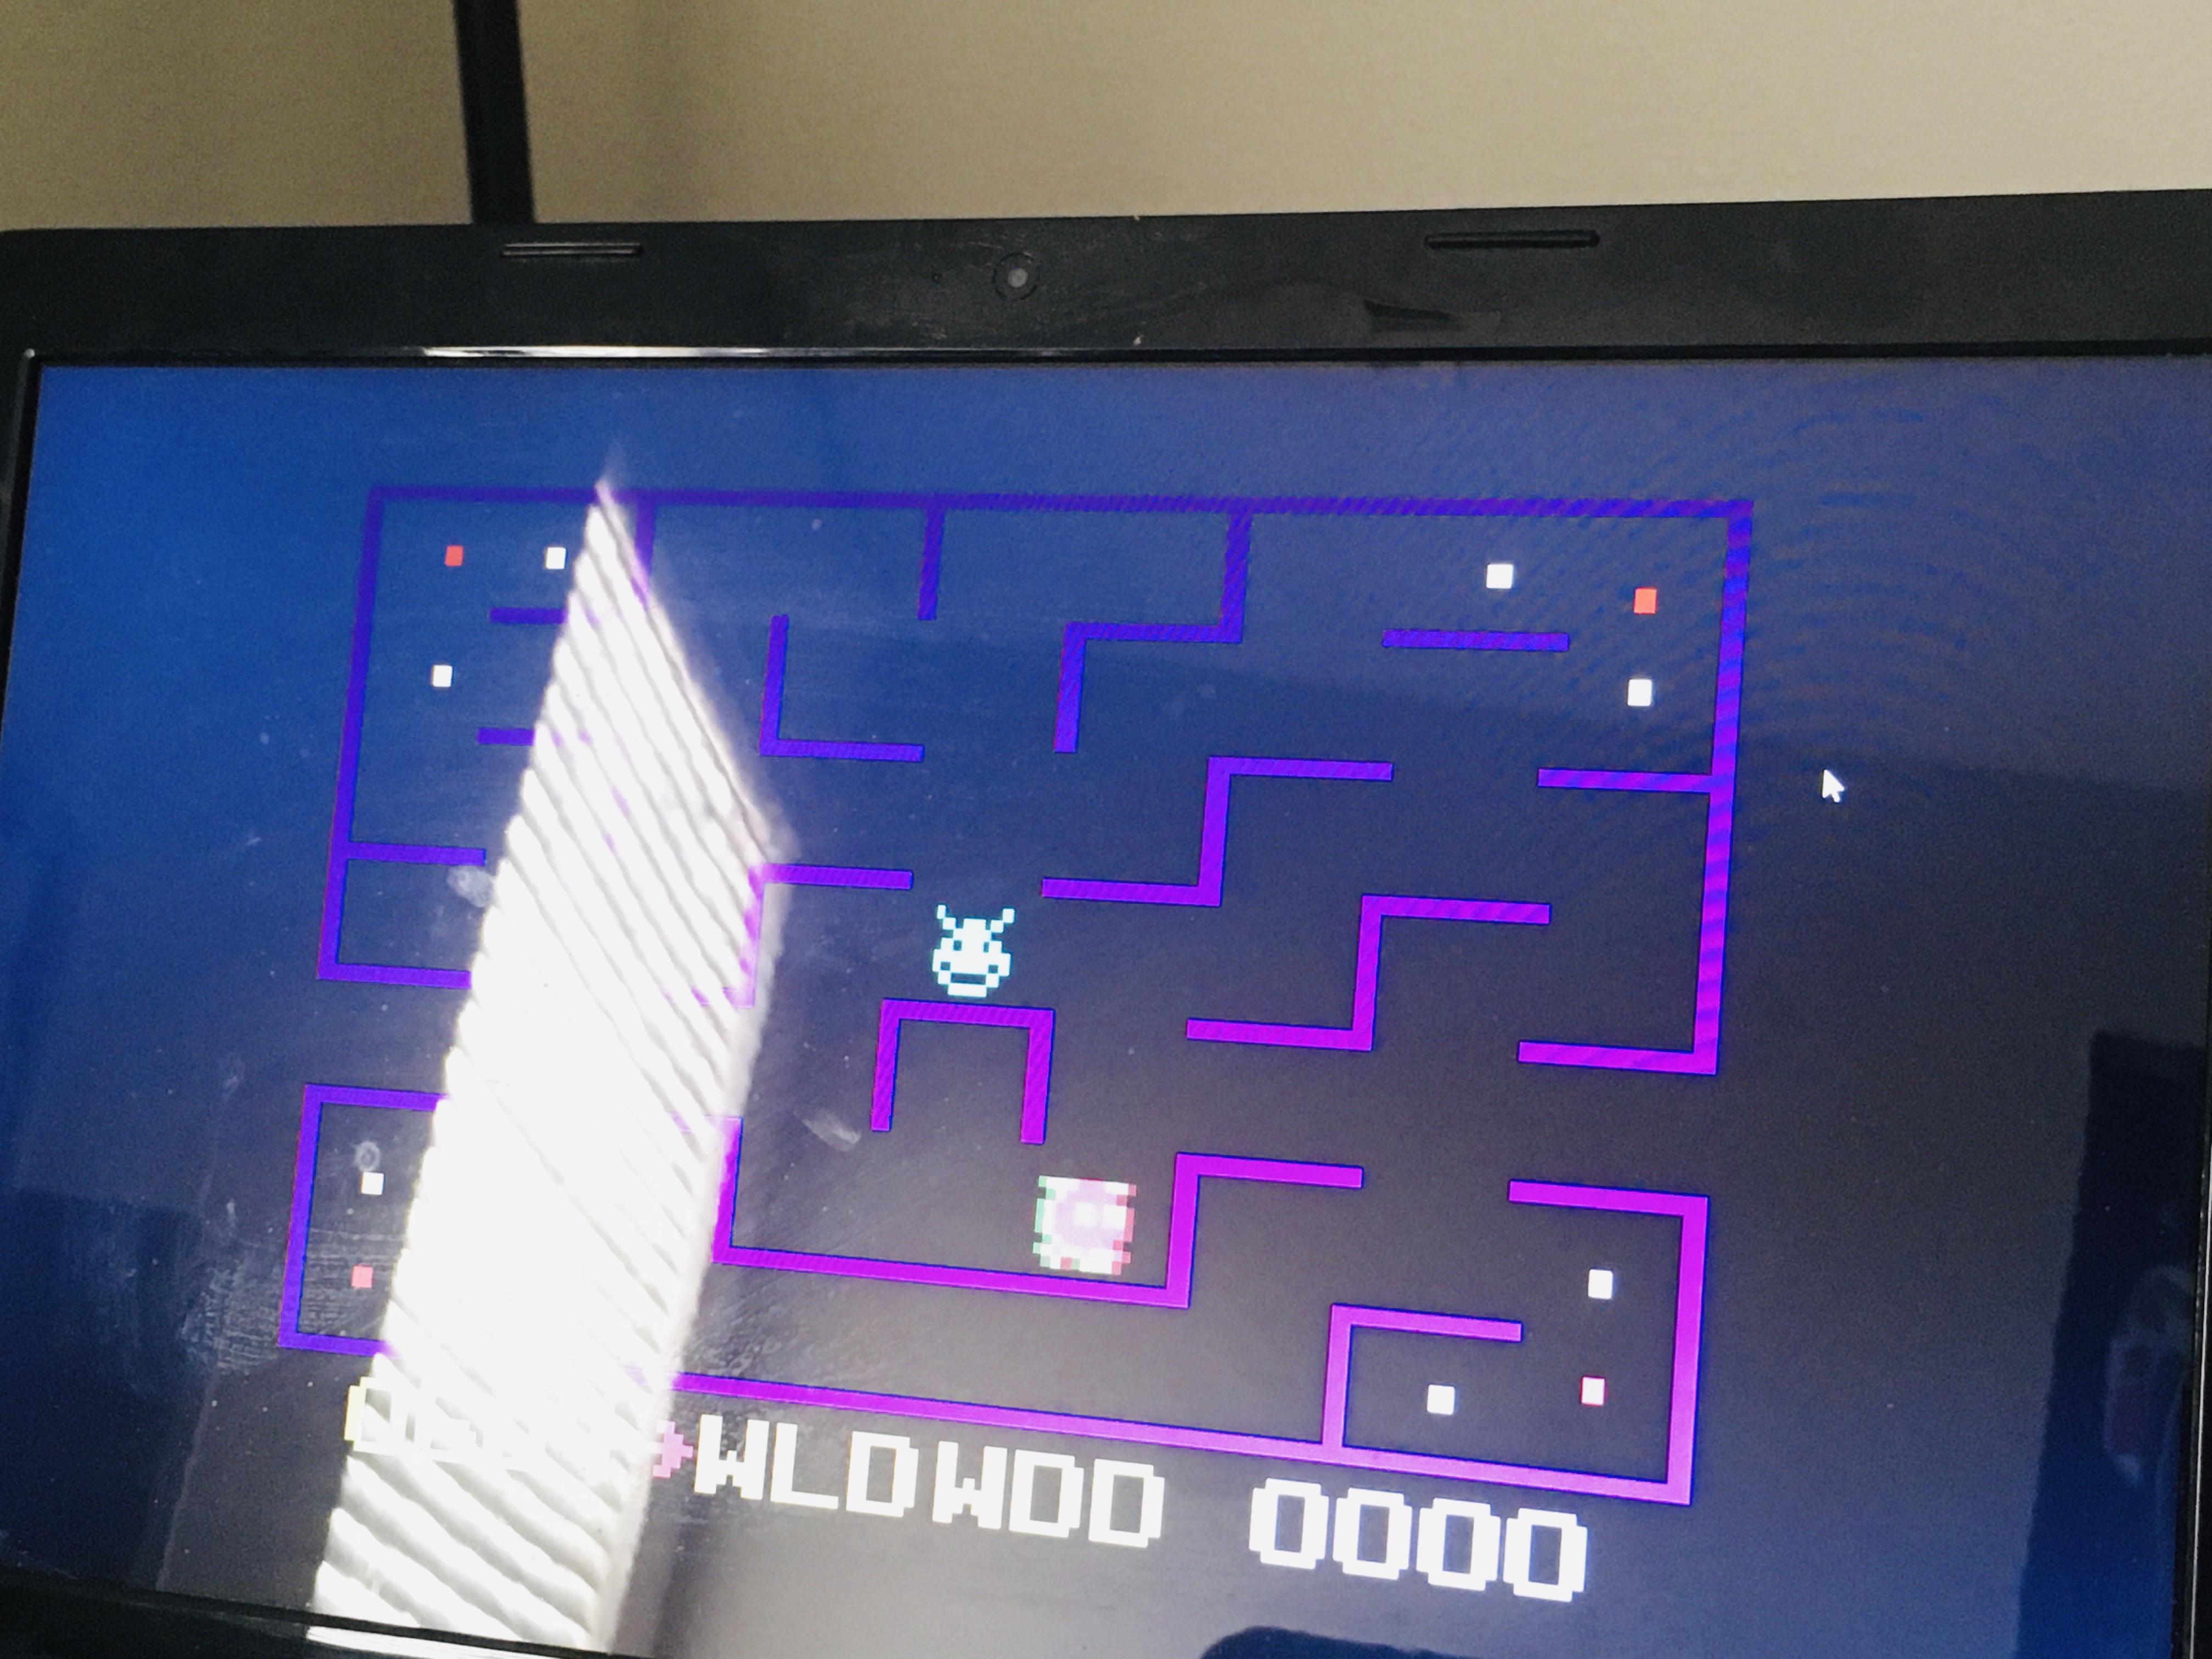 WDD: KC Munchkin [Any Standard Maze] (Odyssey 2 / Videopac Emulated) 604 points on 2020-08-02 14:30:25